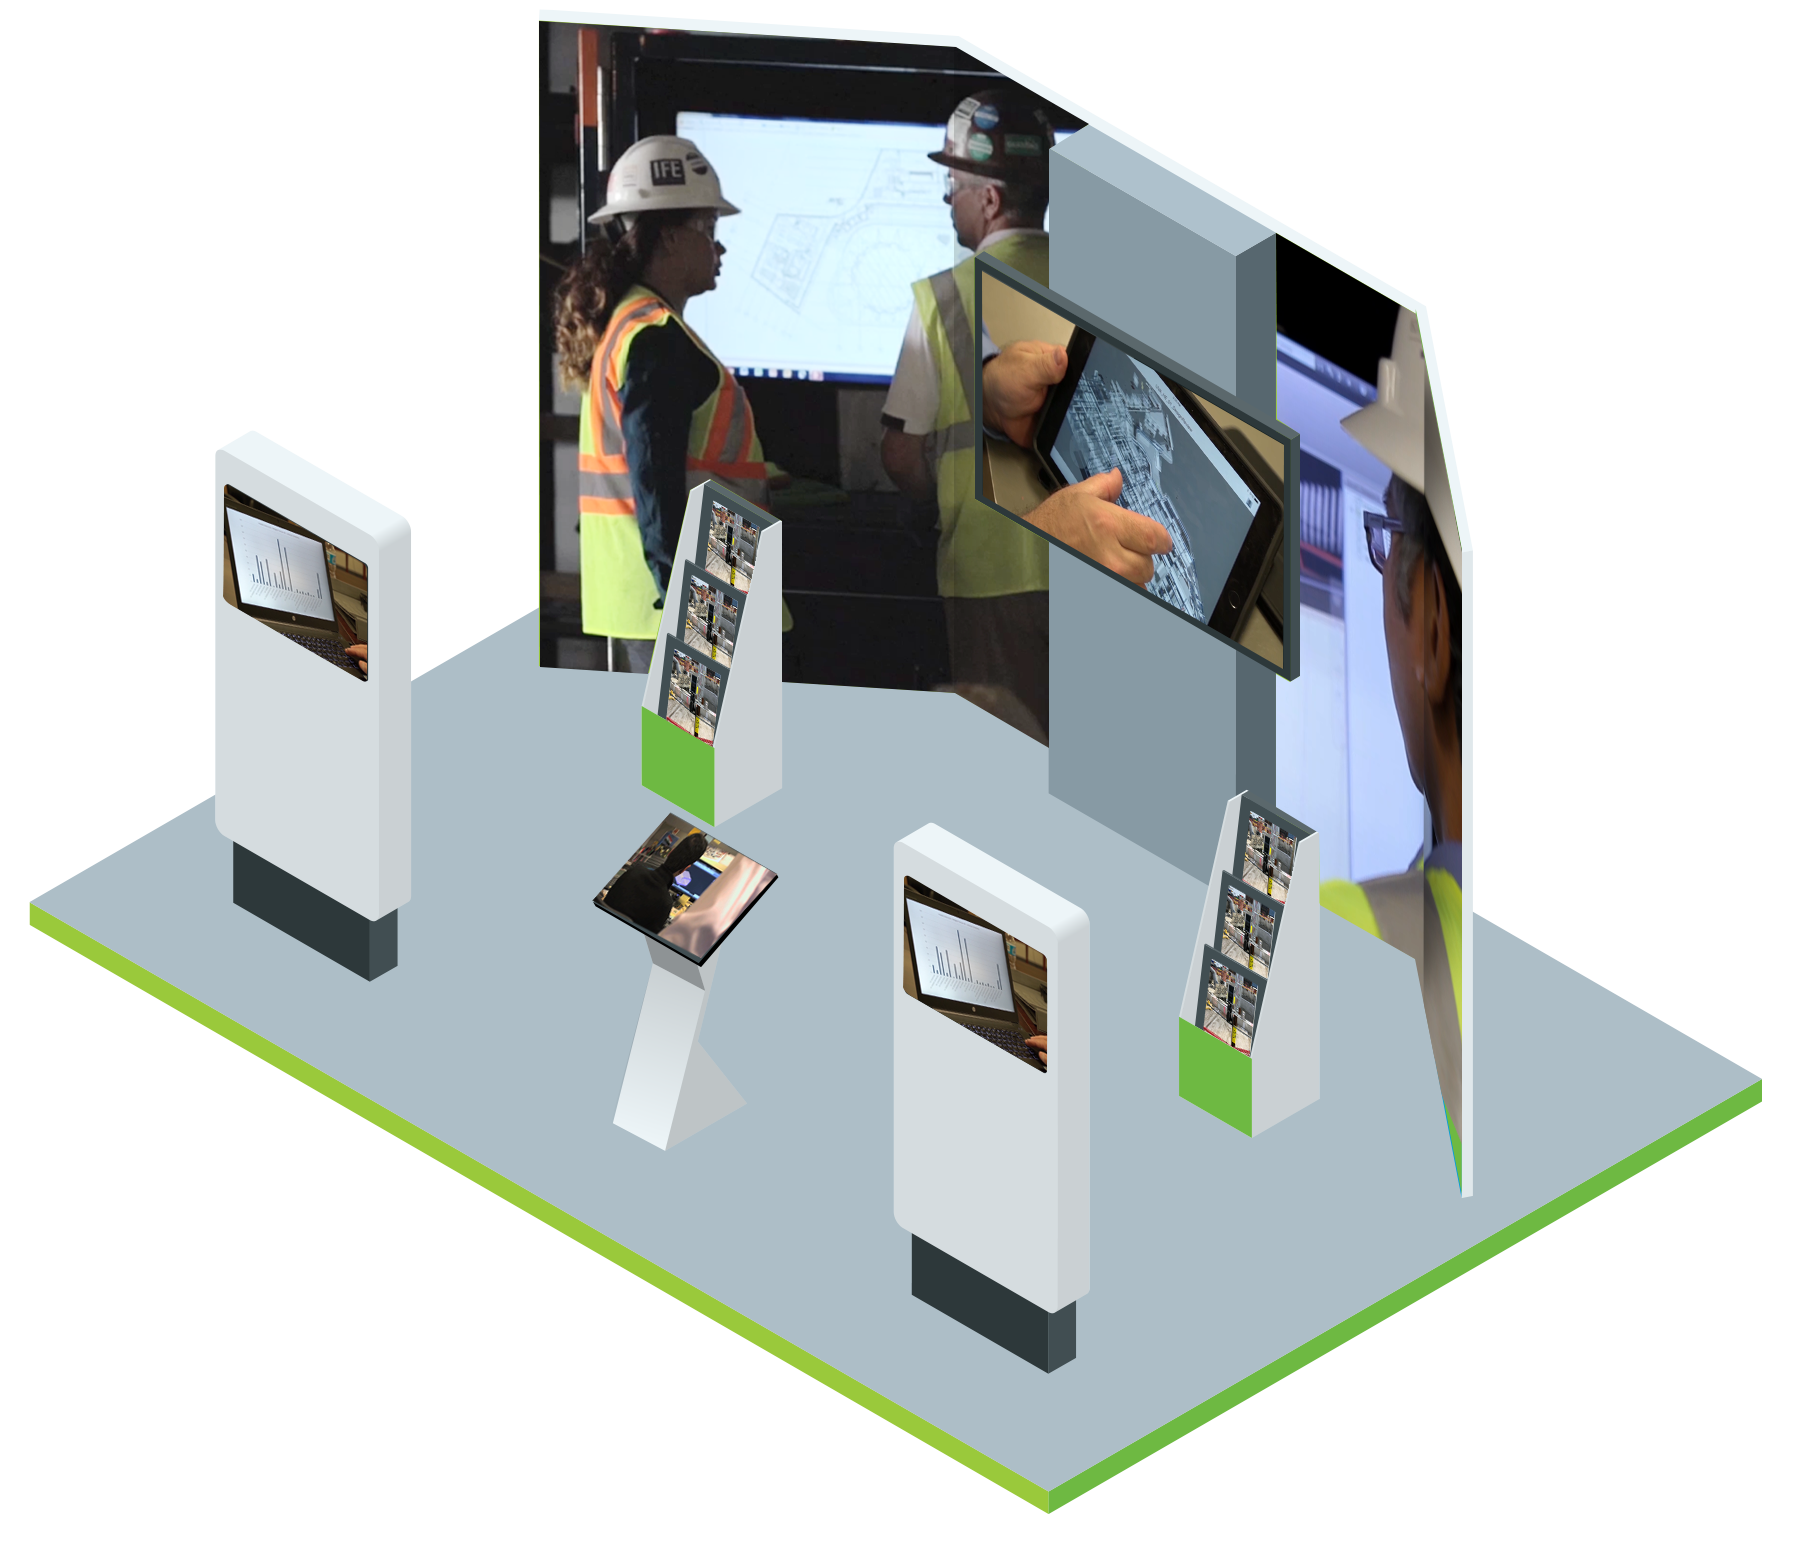 Camera Vision Booth